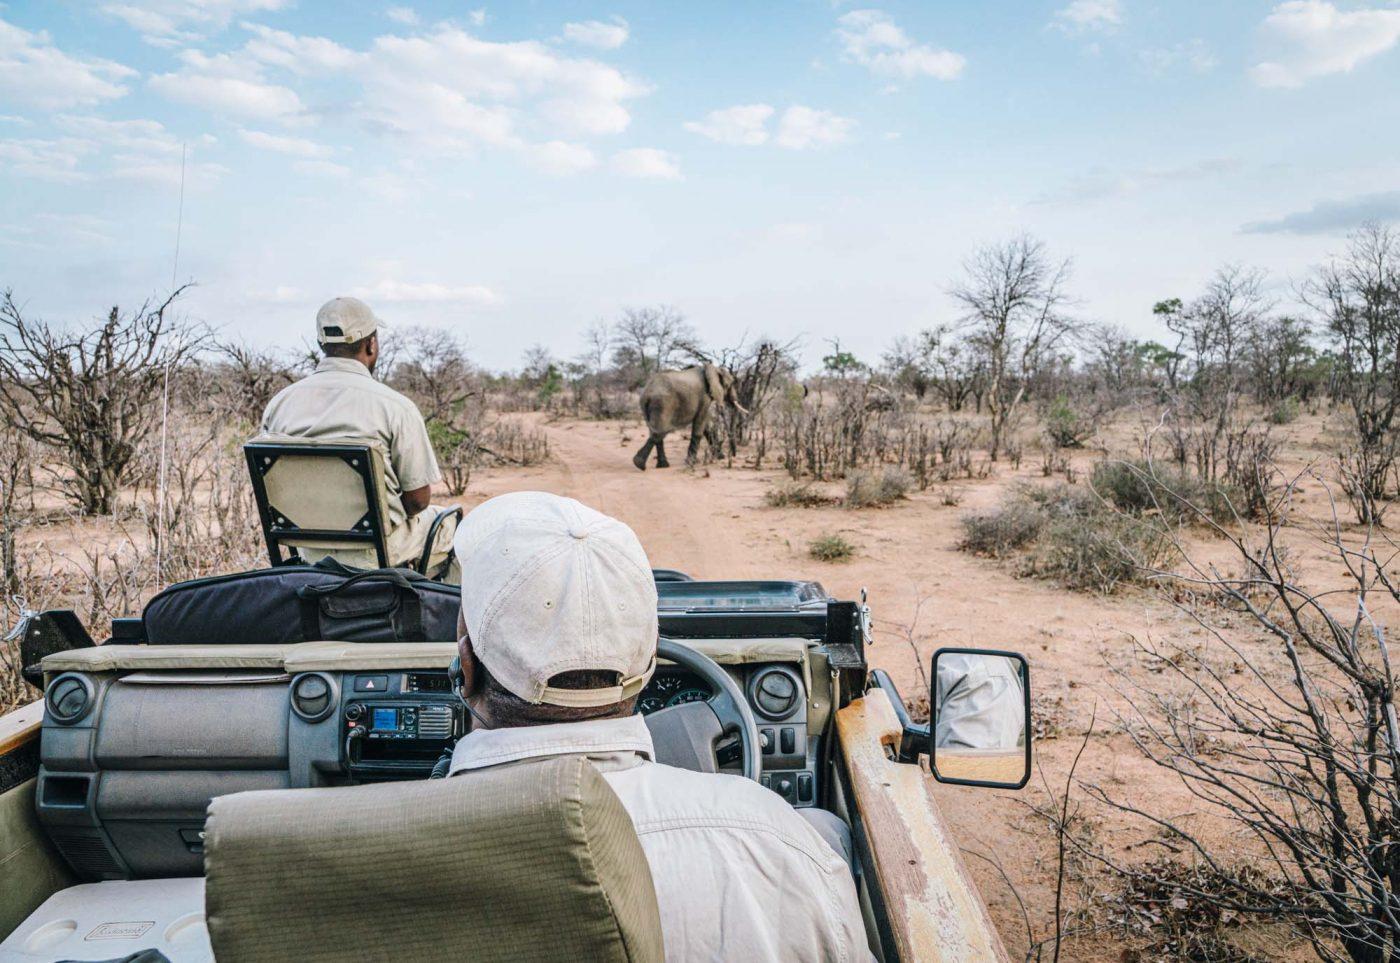 Morning game drive at Umlani Bushcamp in Timbavati Nature Reserve